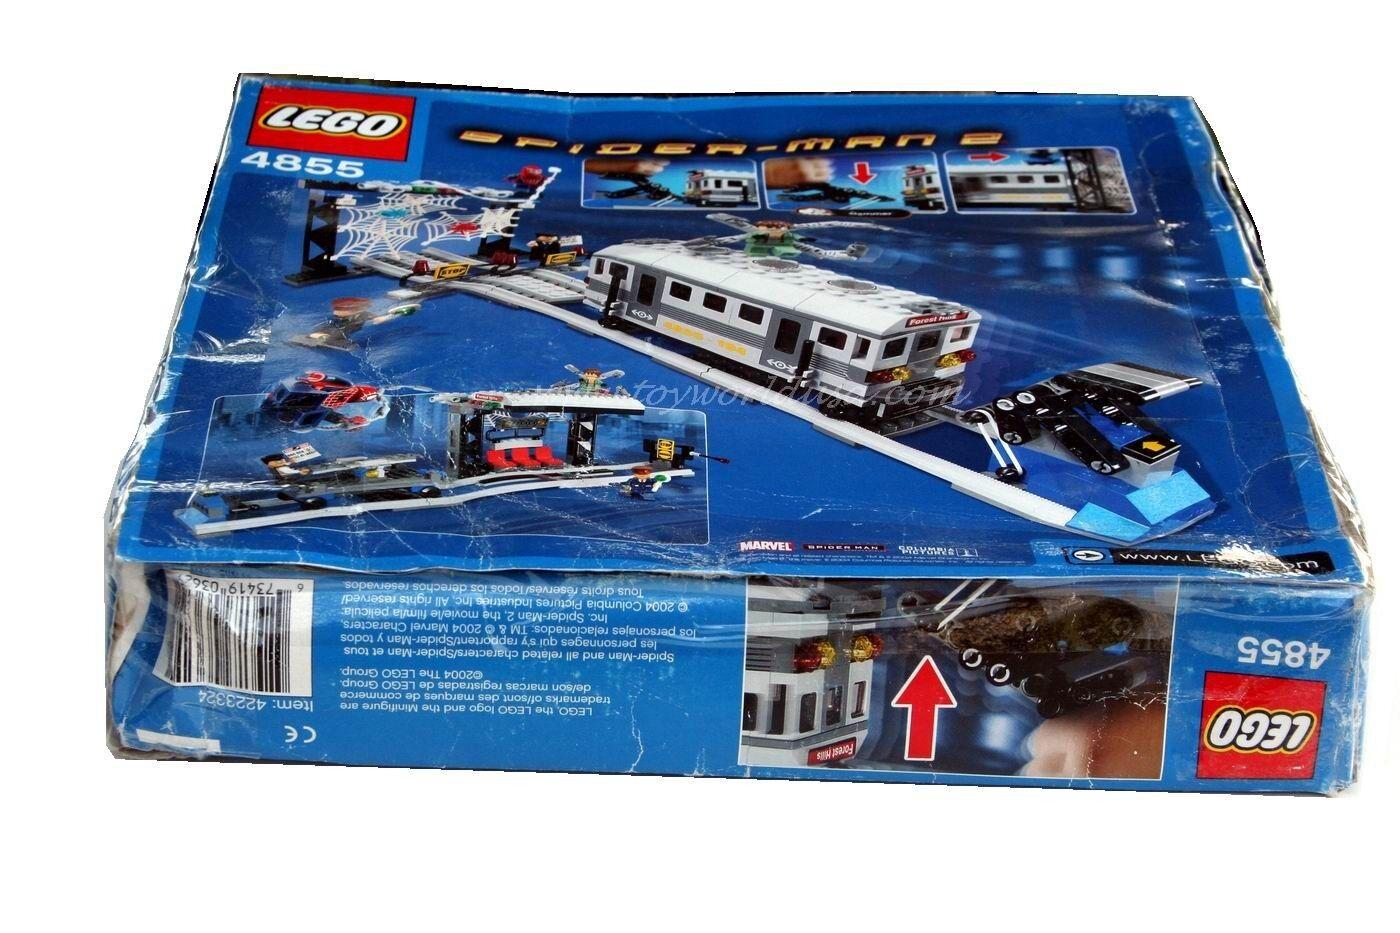 Lego Spider  homme 2 Spider-Man 's Train  Rescue  4855 Building Toy Set non-Comme neuf BOX  magasin en ligne